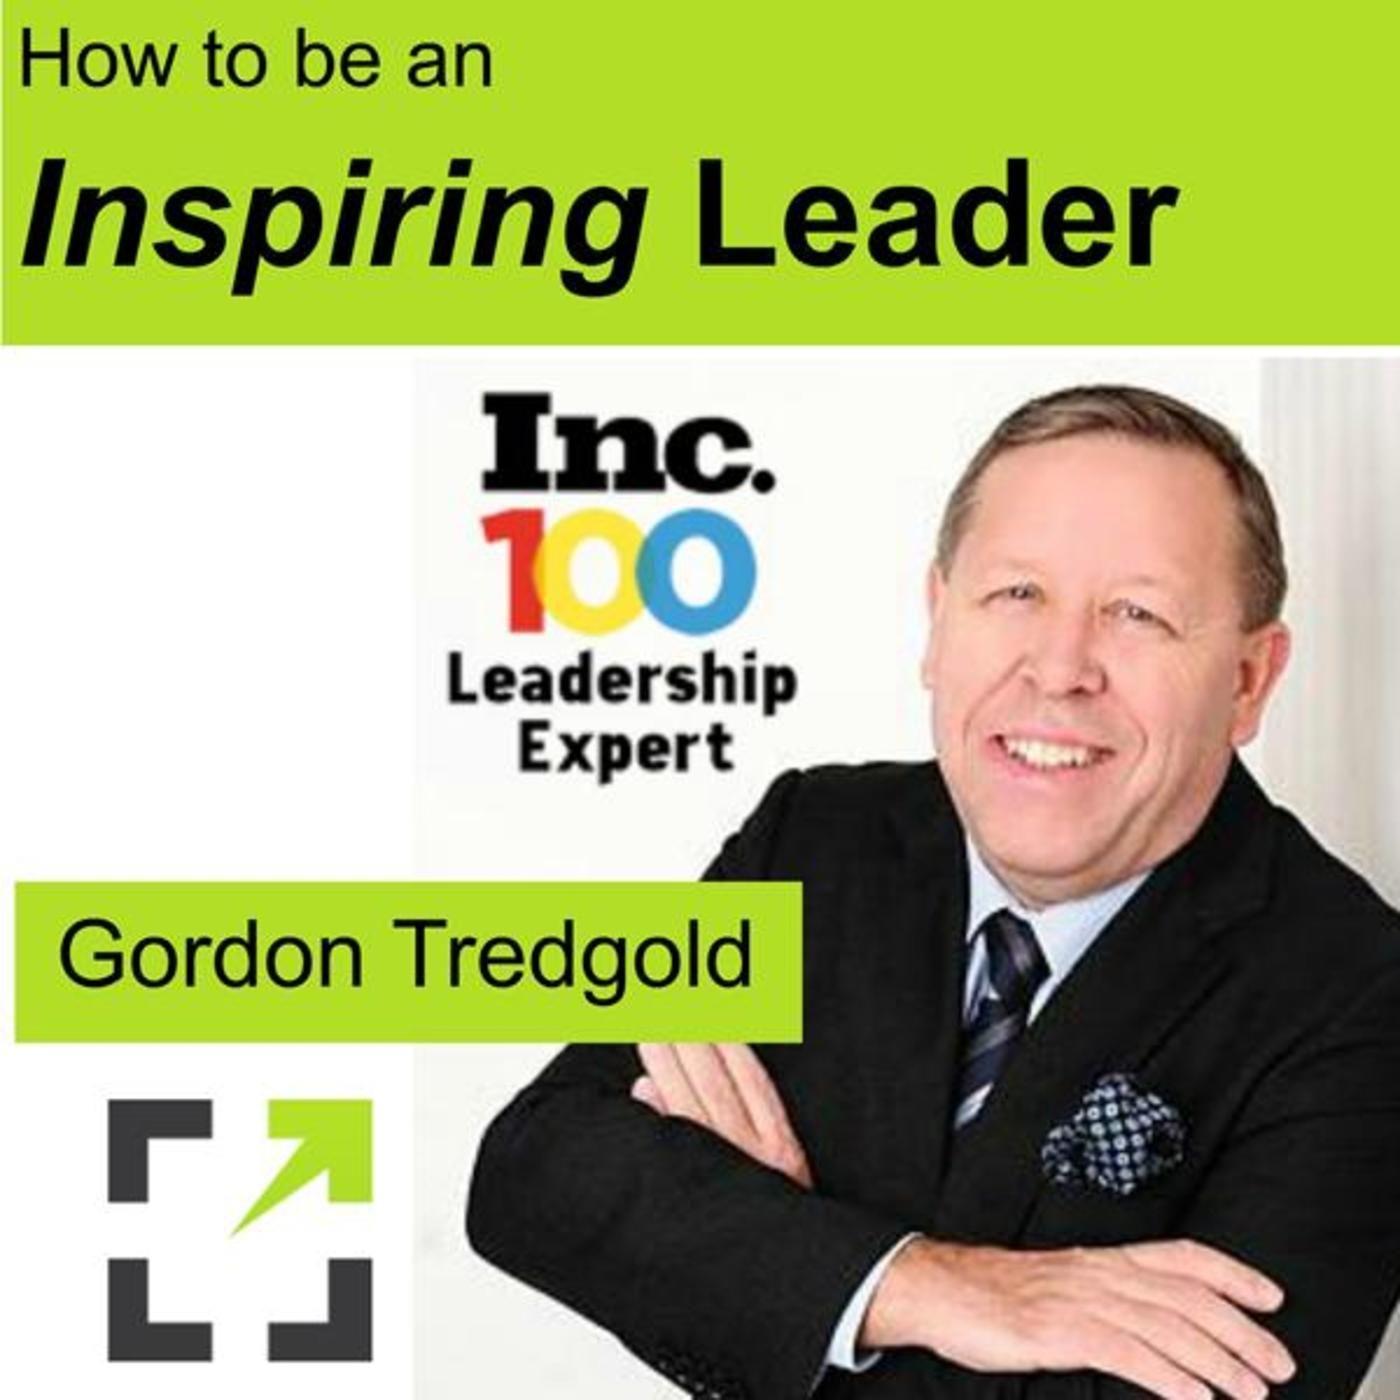 People leave Bosses, not Companies...Is it lack of Leadership or something else?